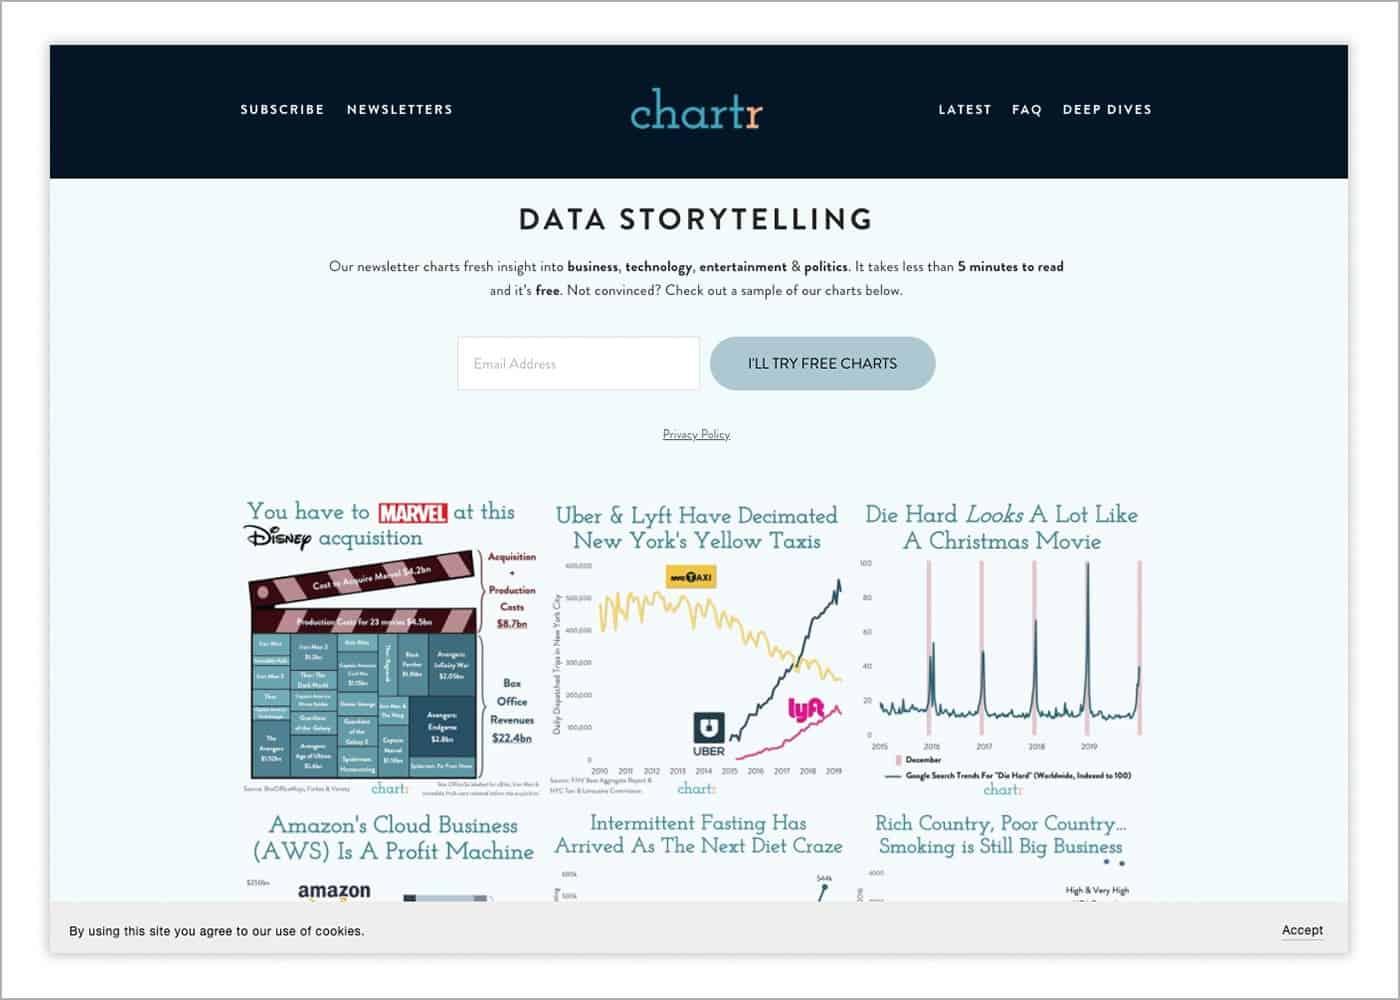 chartr data source